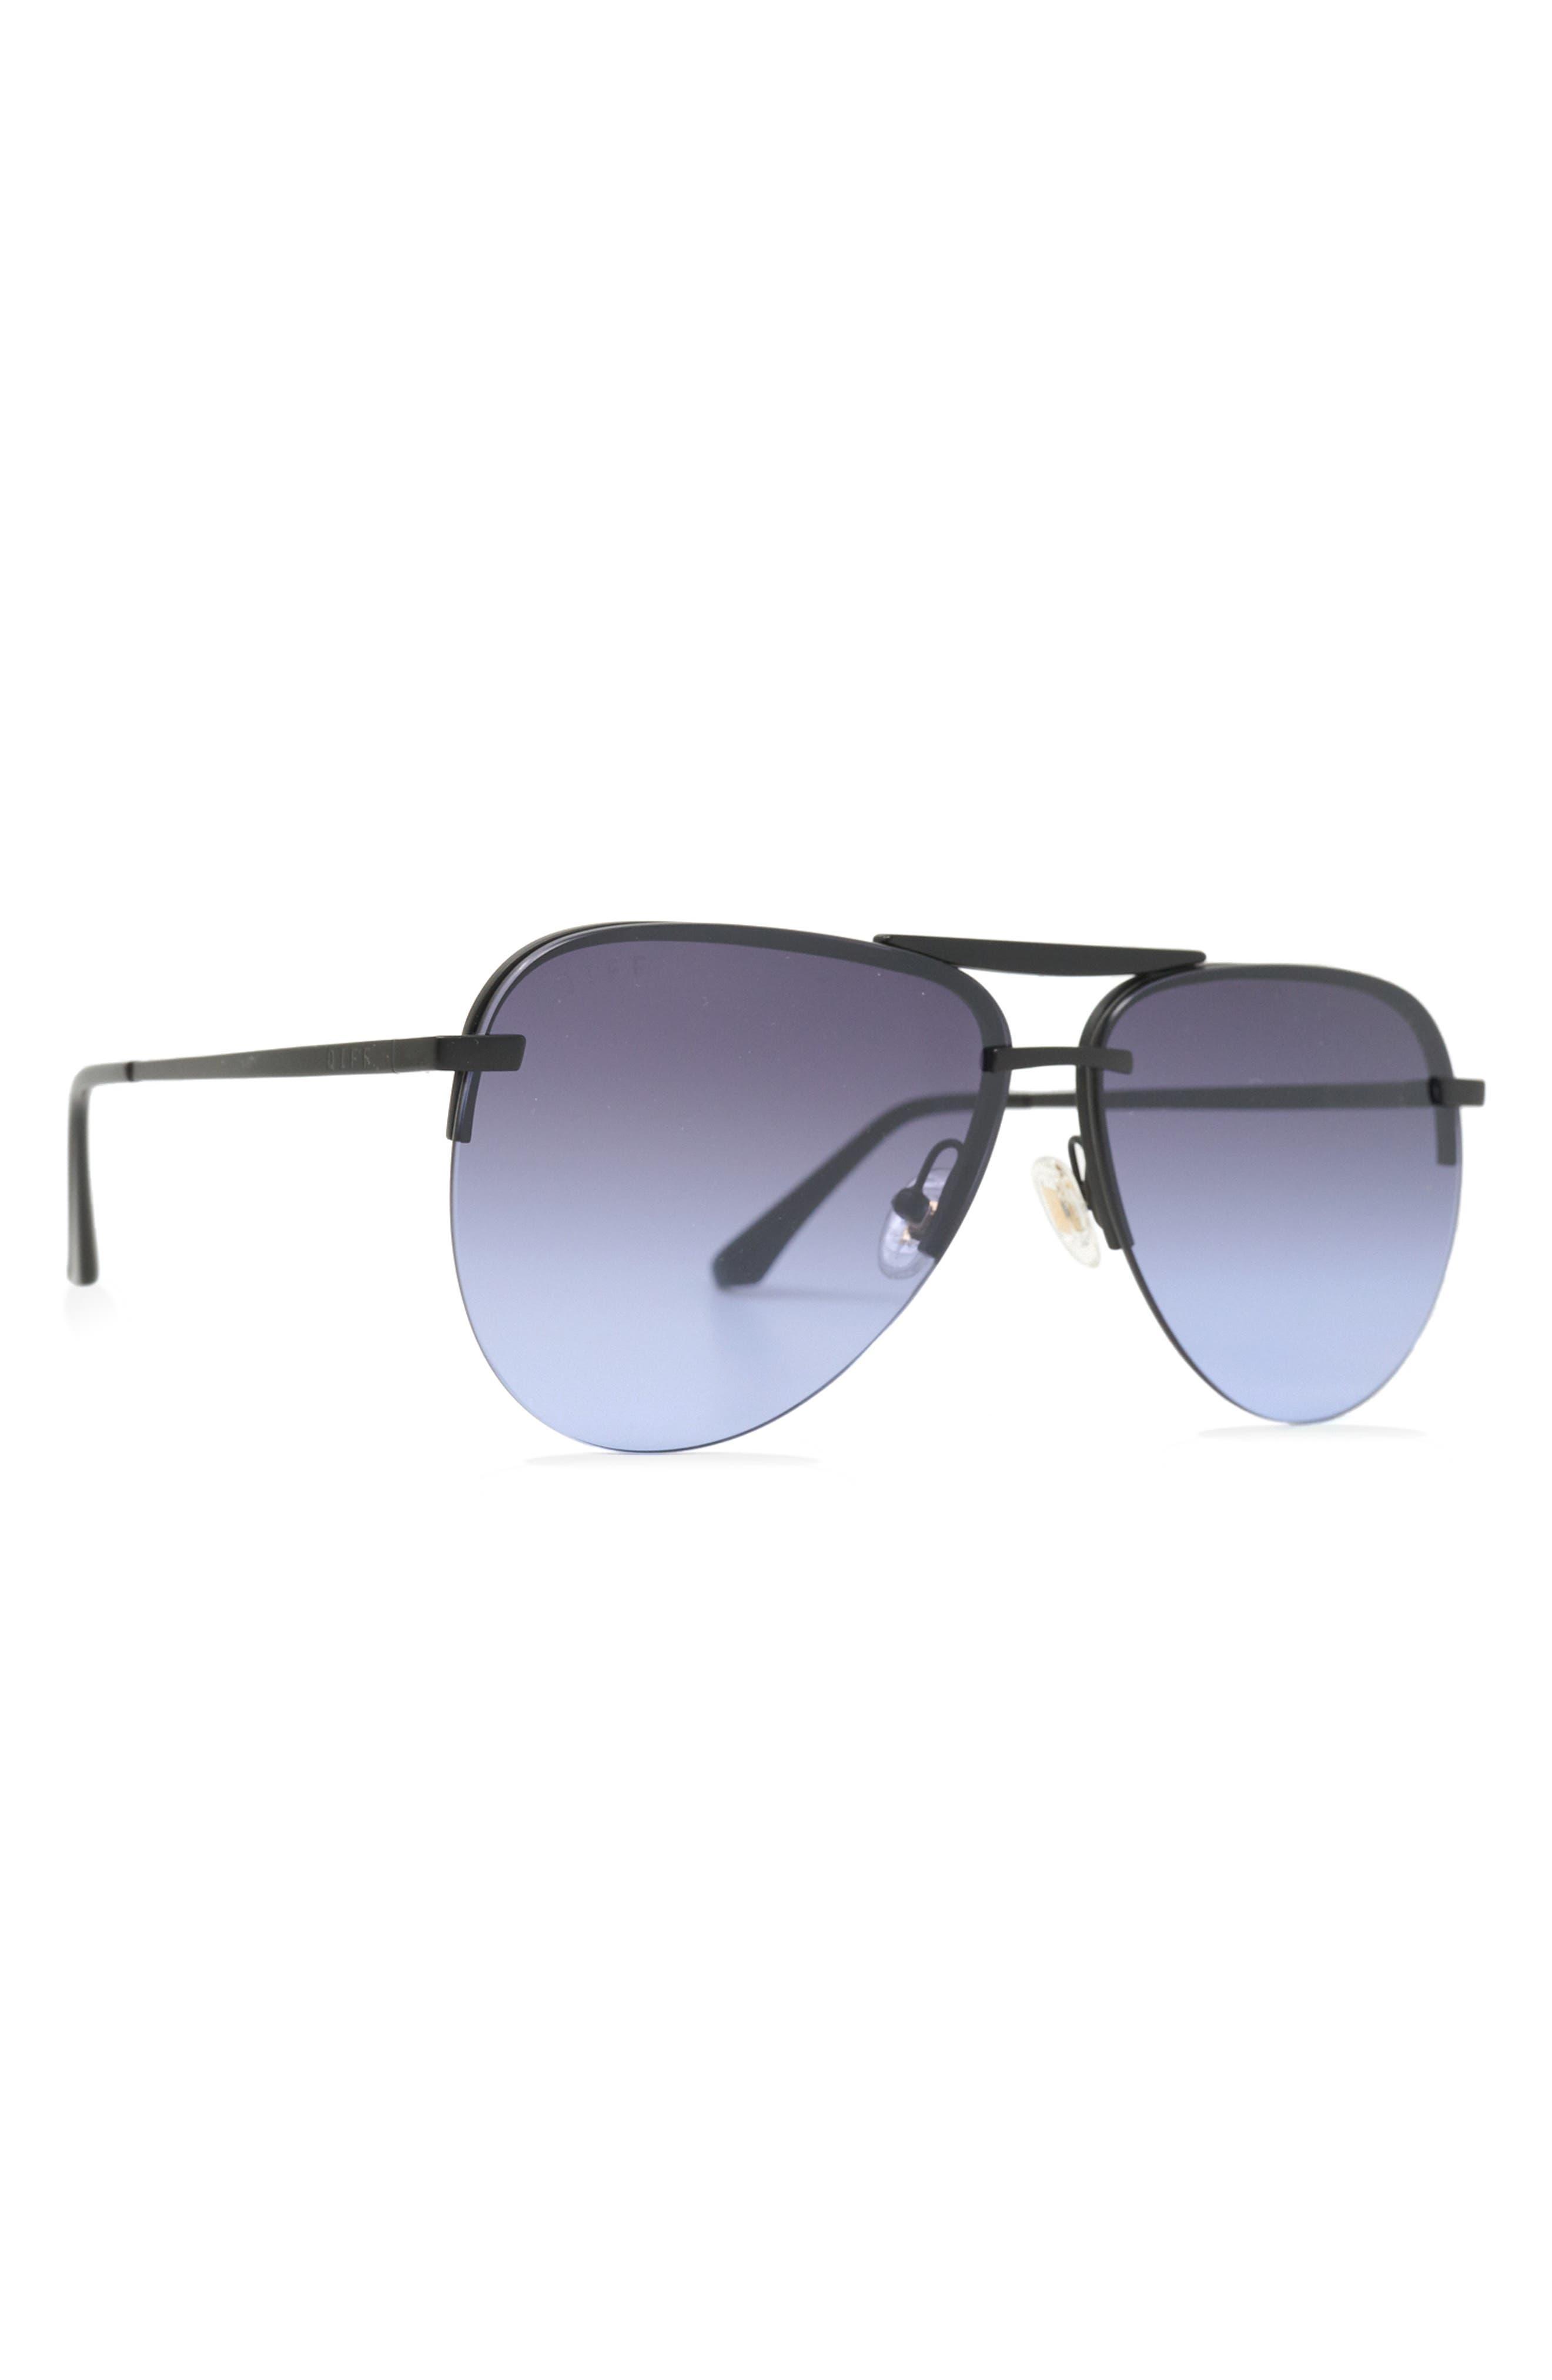 Tahoe 63mm Gradient Oversize Aviator Sunglasses